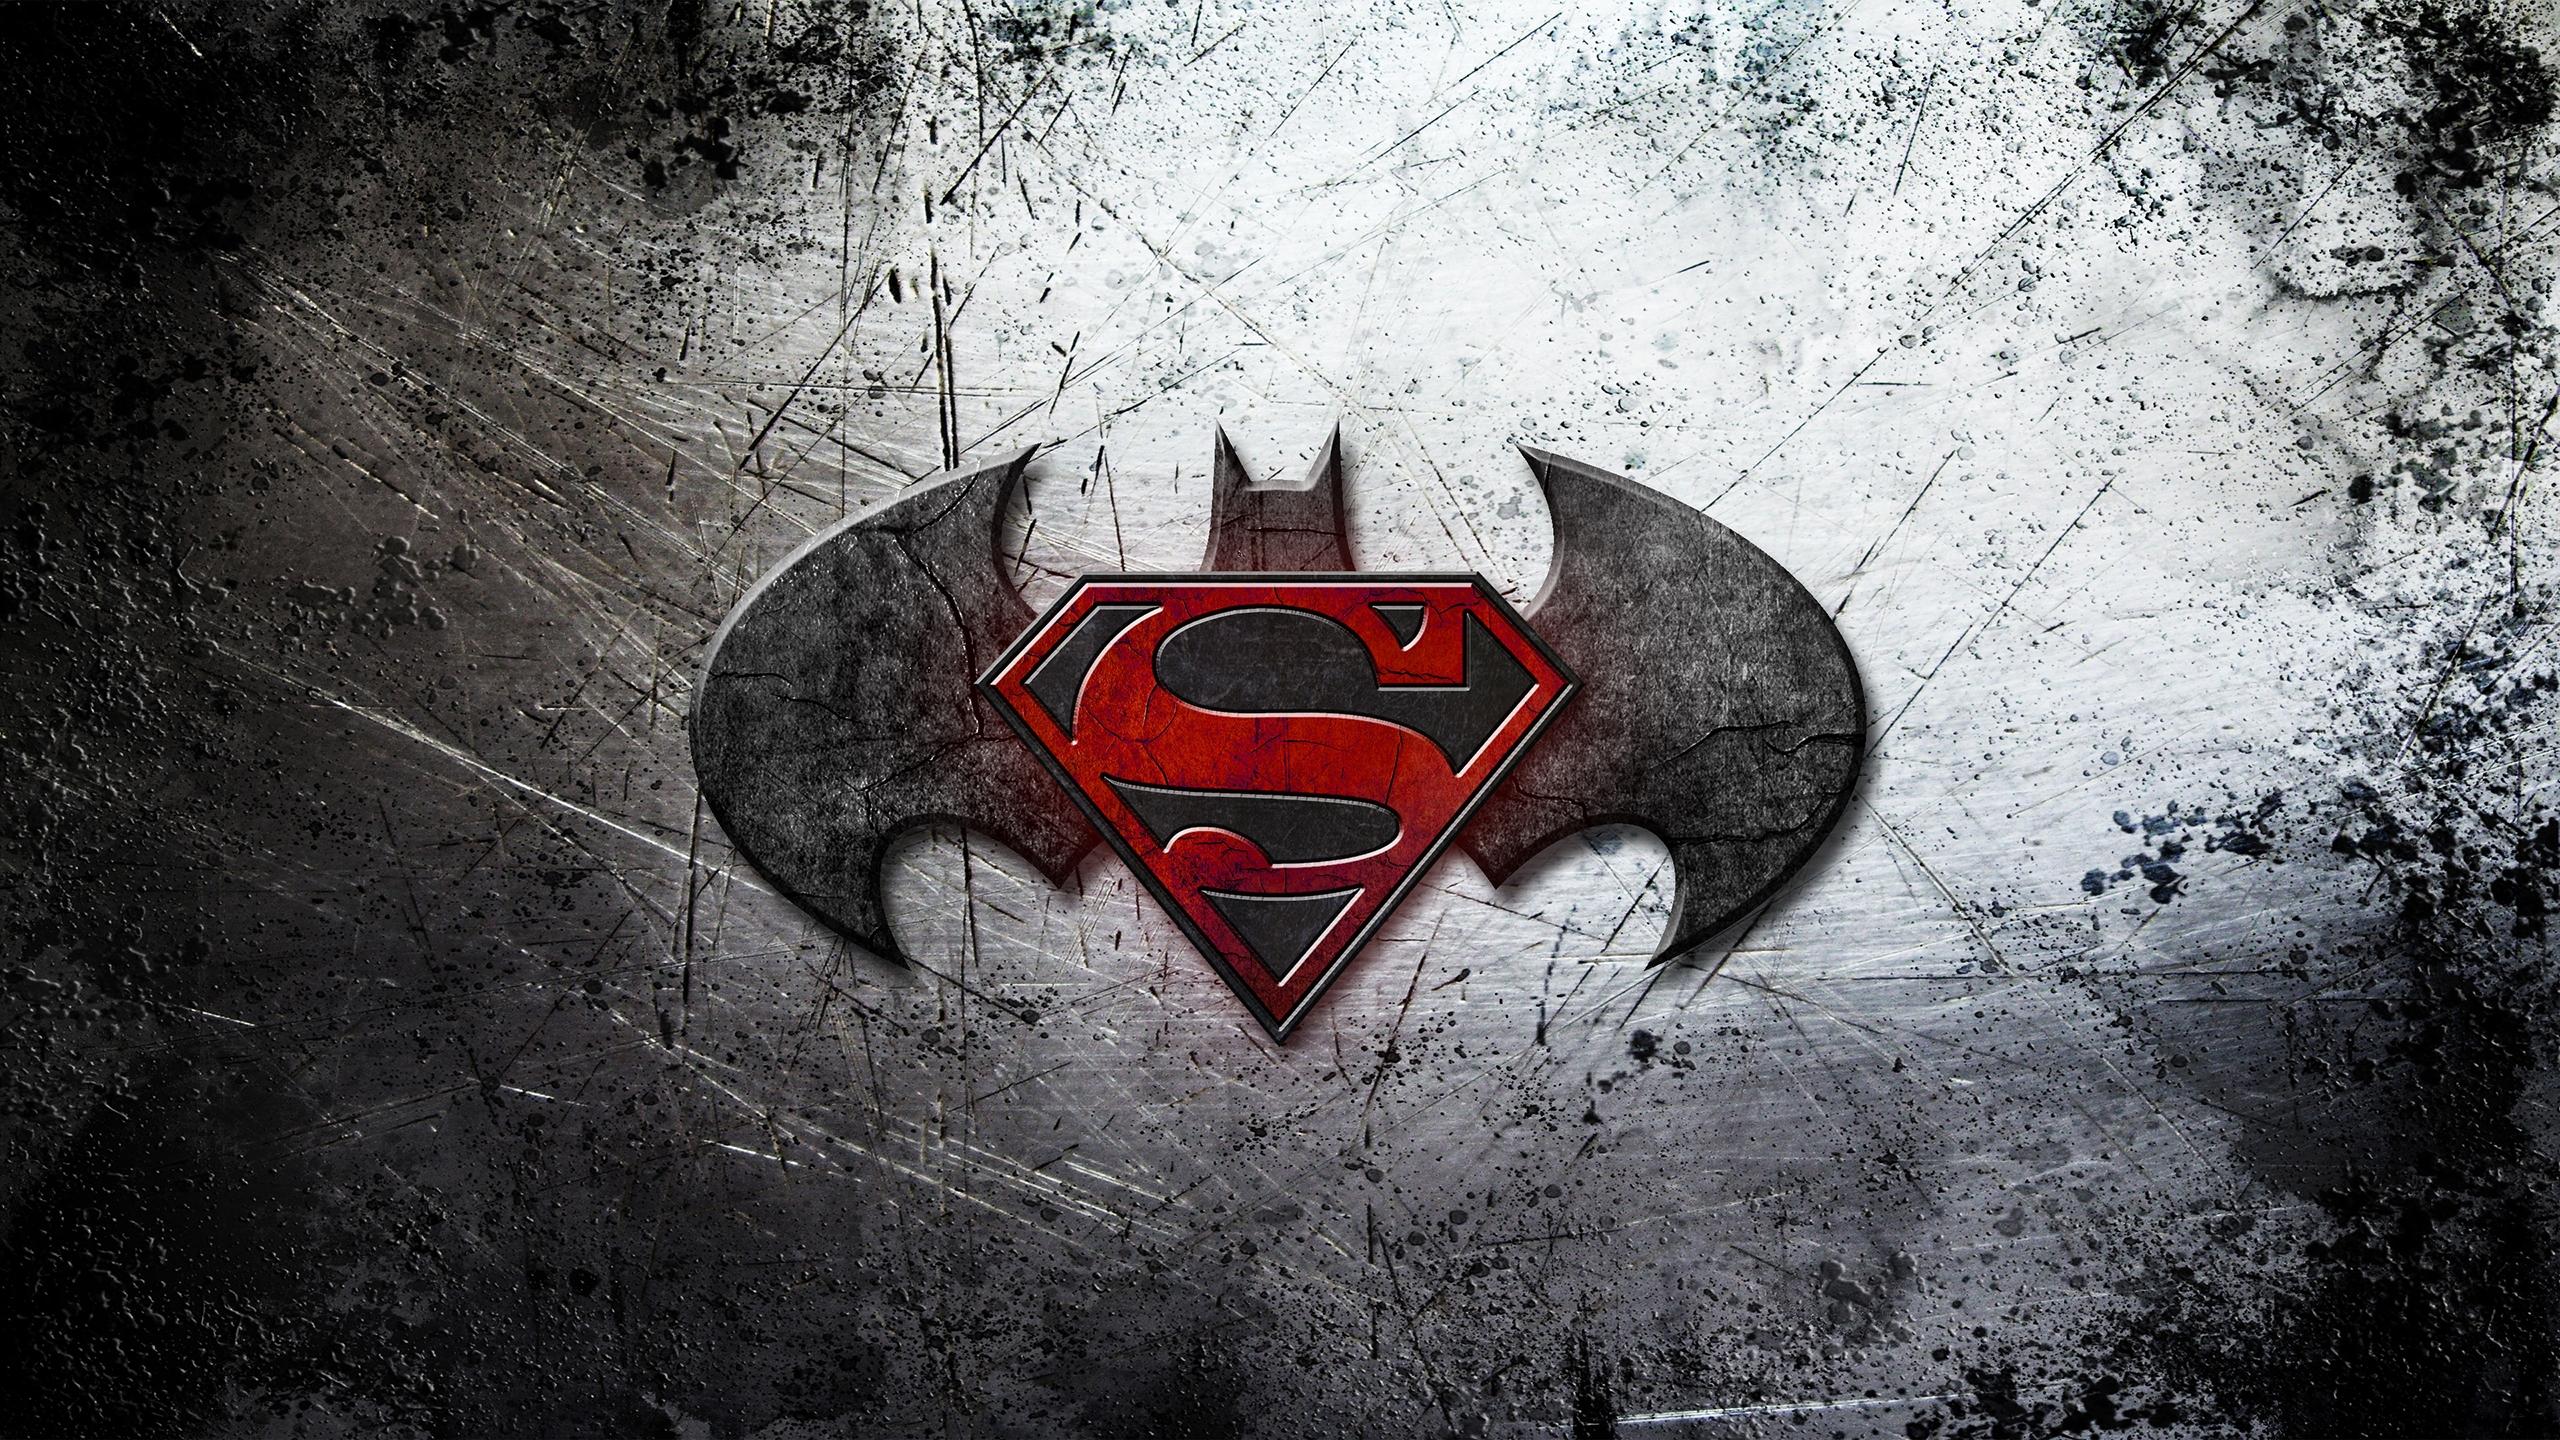 Batman vs Superman Logo Wallpaper   HD Background 2560x1440